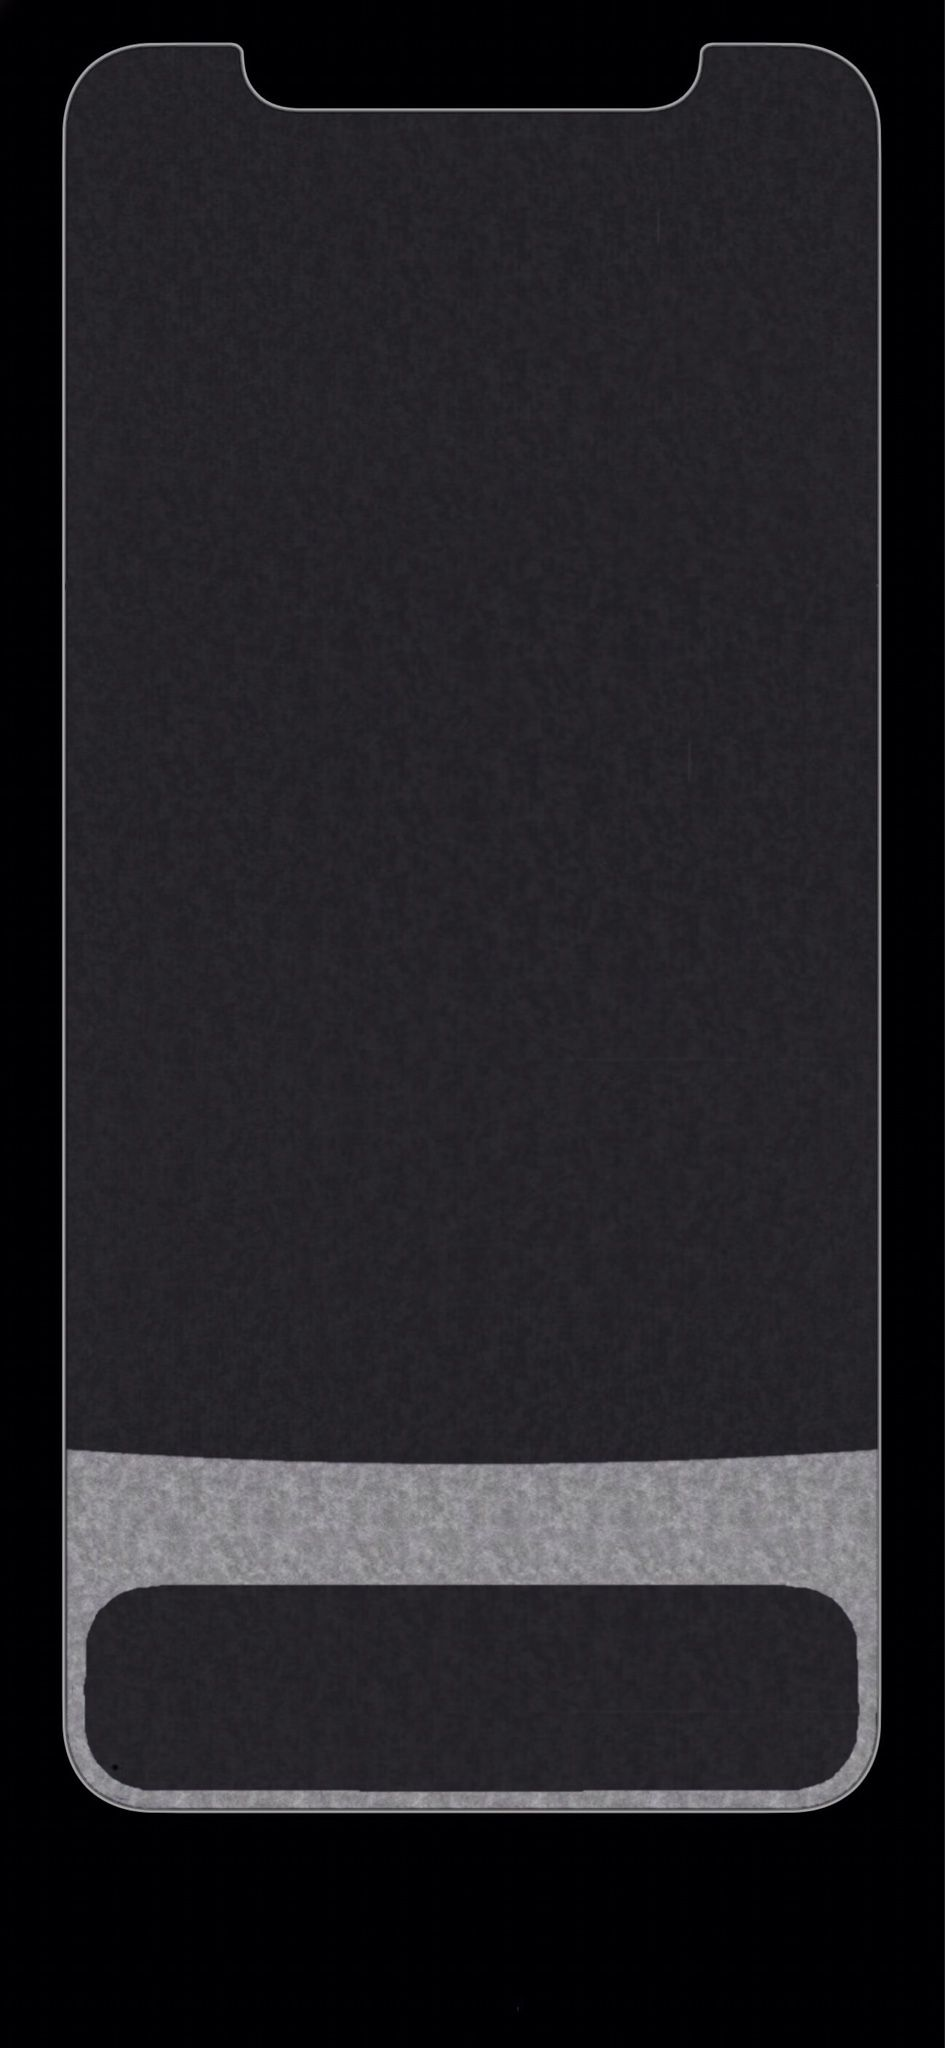 Pin On Iphone X Wallpaper